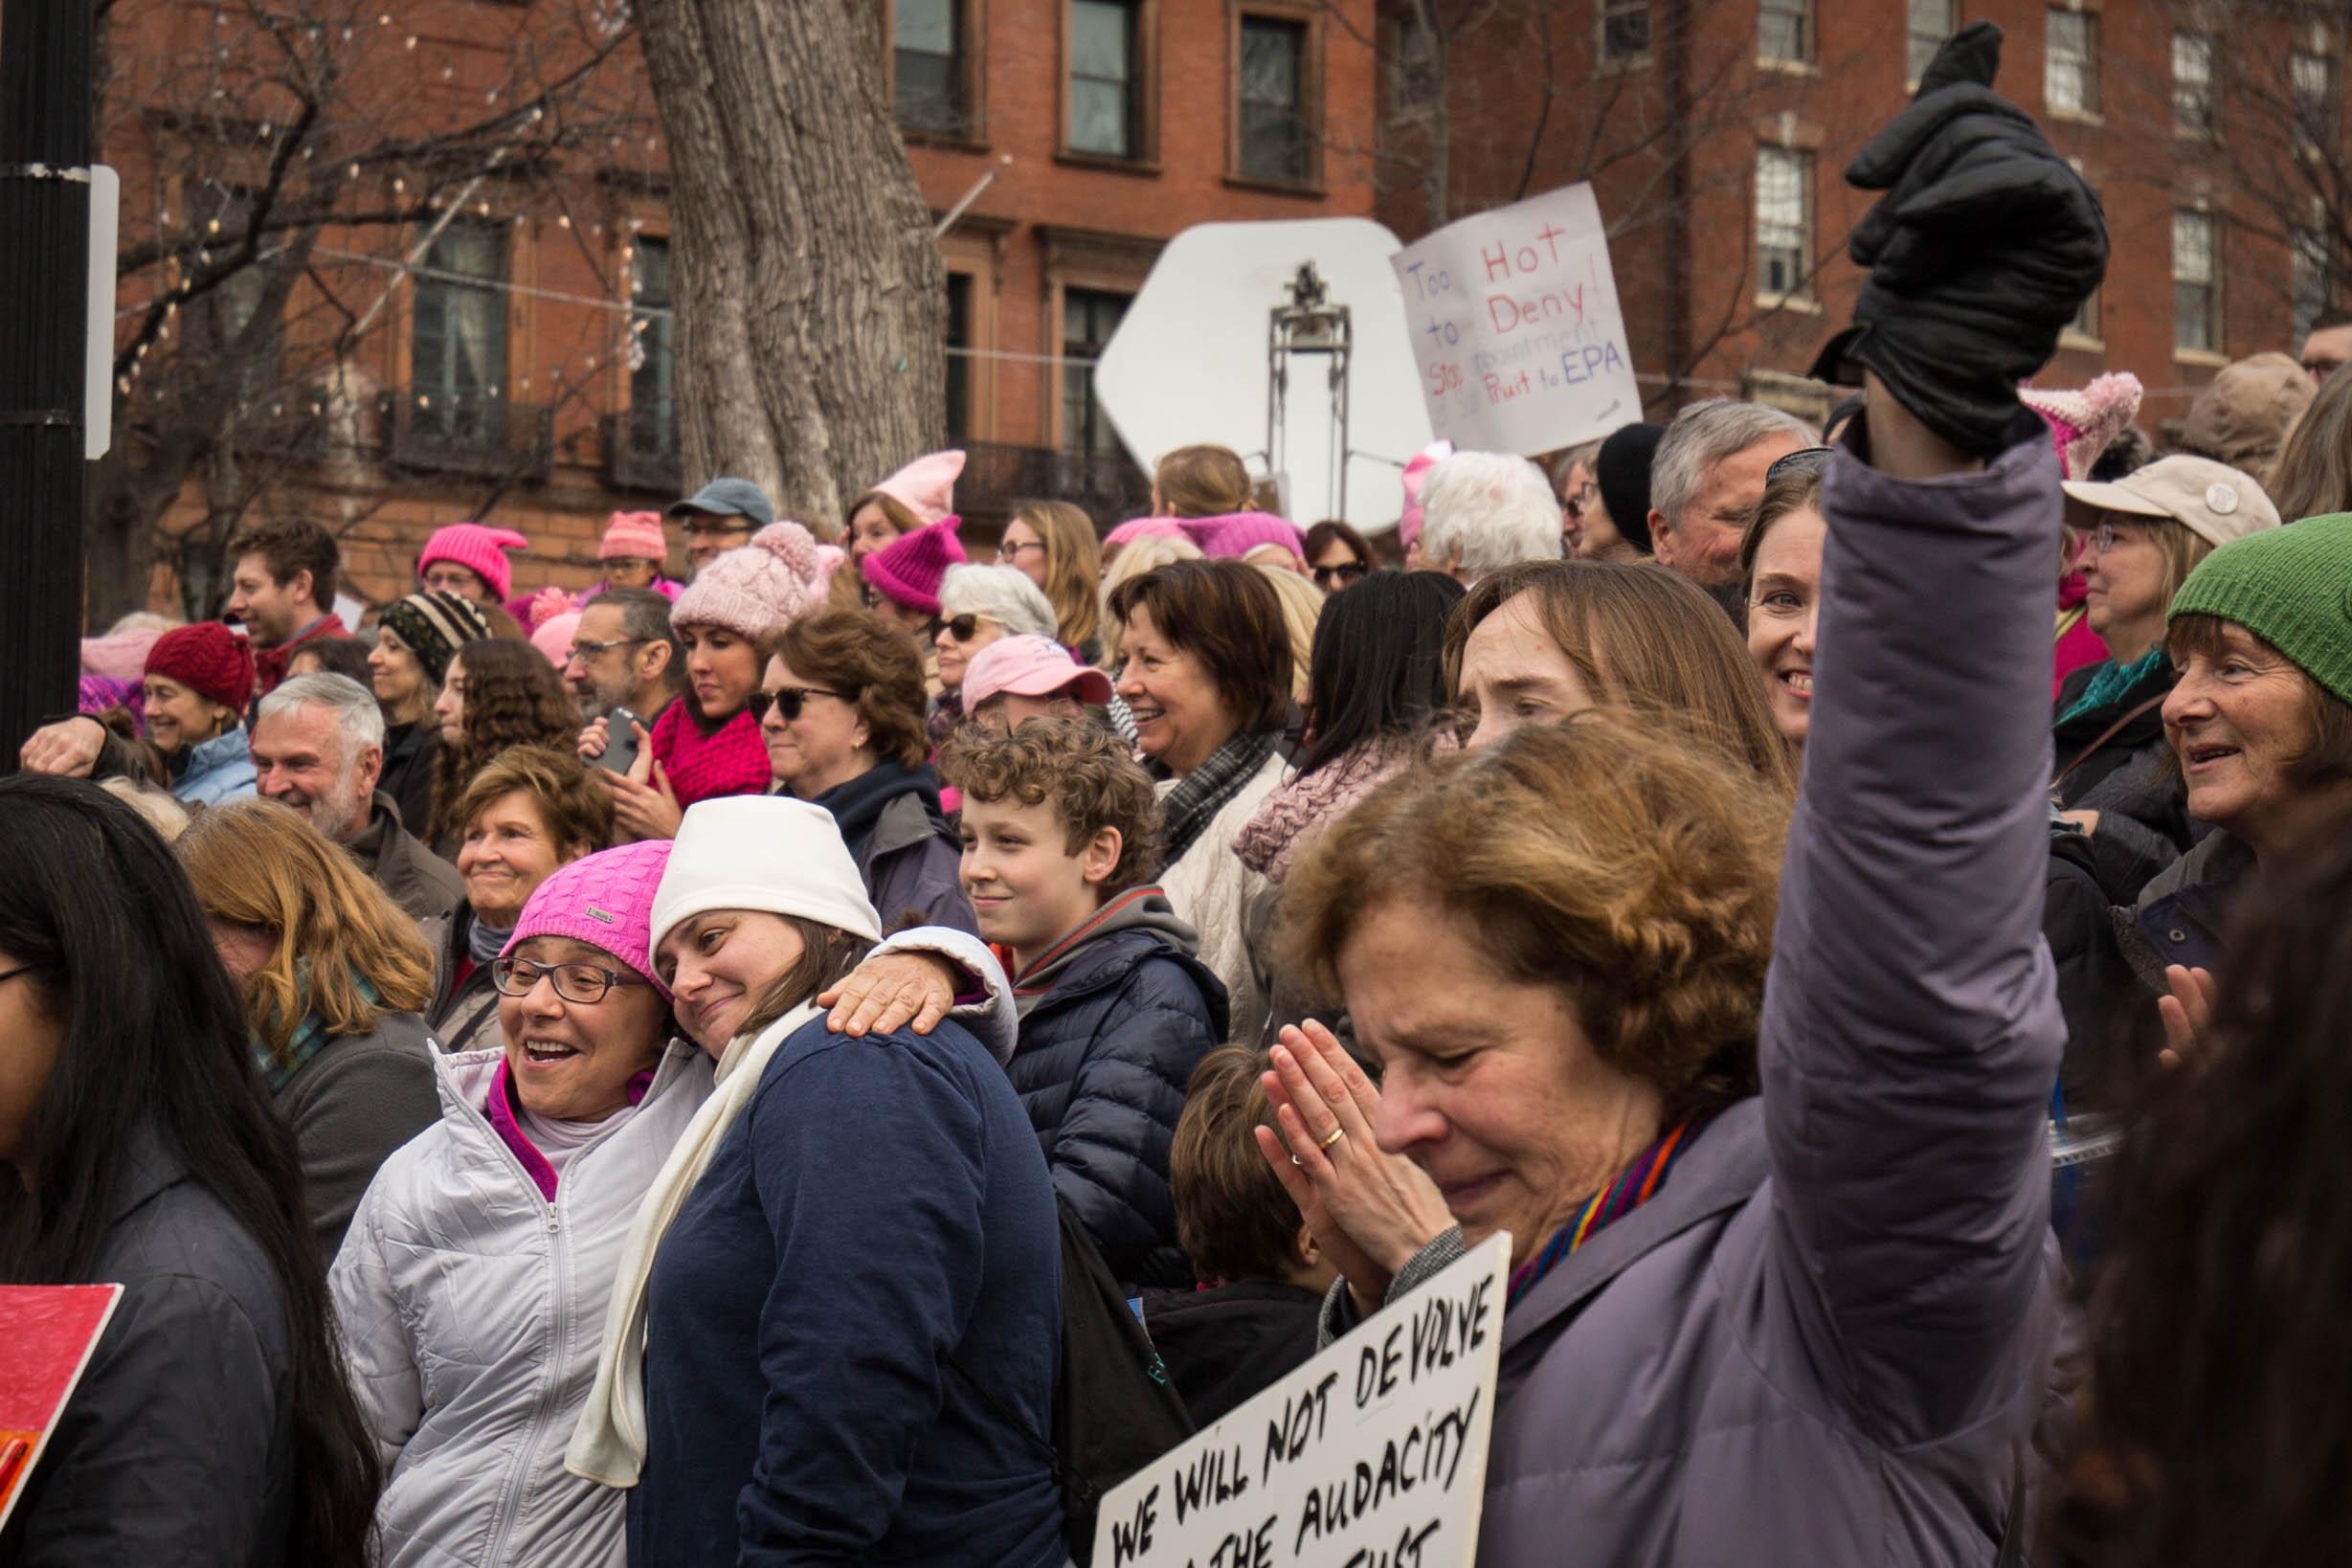 Participants react when Massachusetts Sen. Elizabeth Warren's speaks during the Boston Women's March on Jan. 21, 2017. (Photo by Alastair Pike)